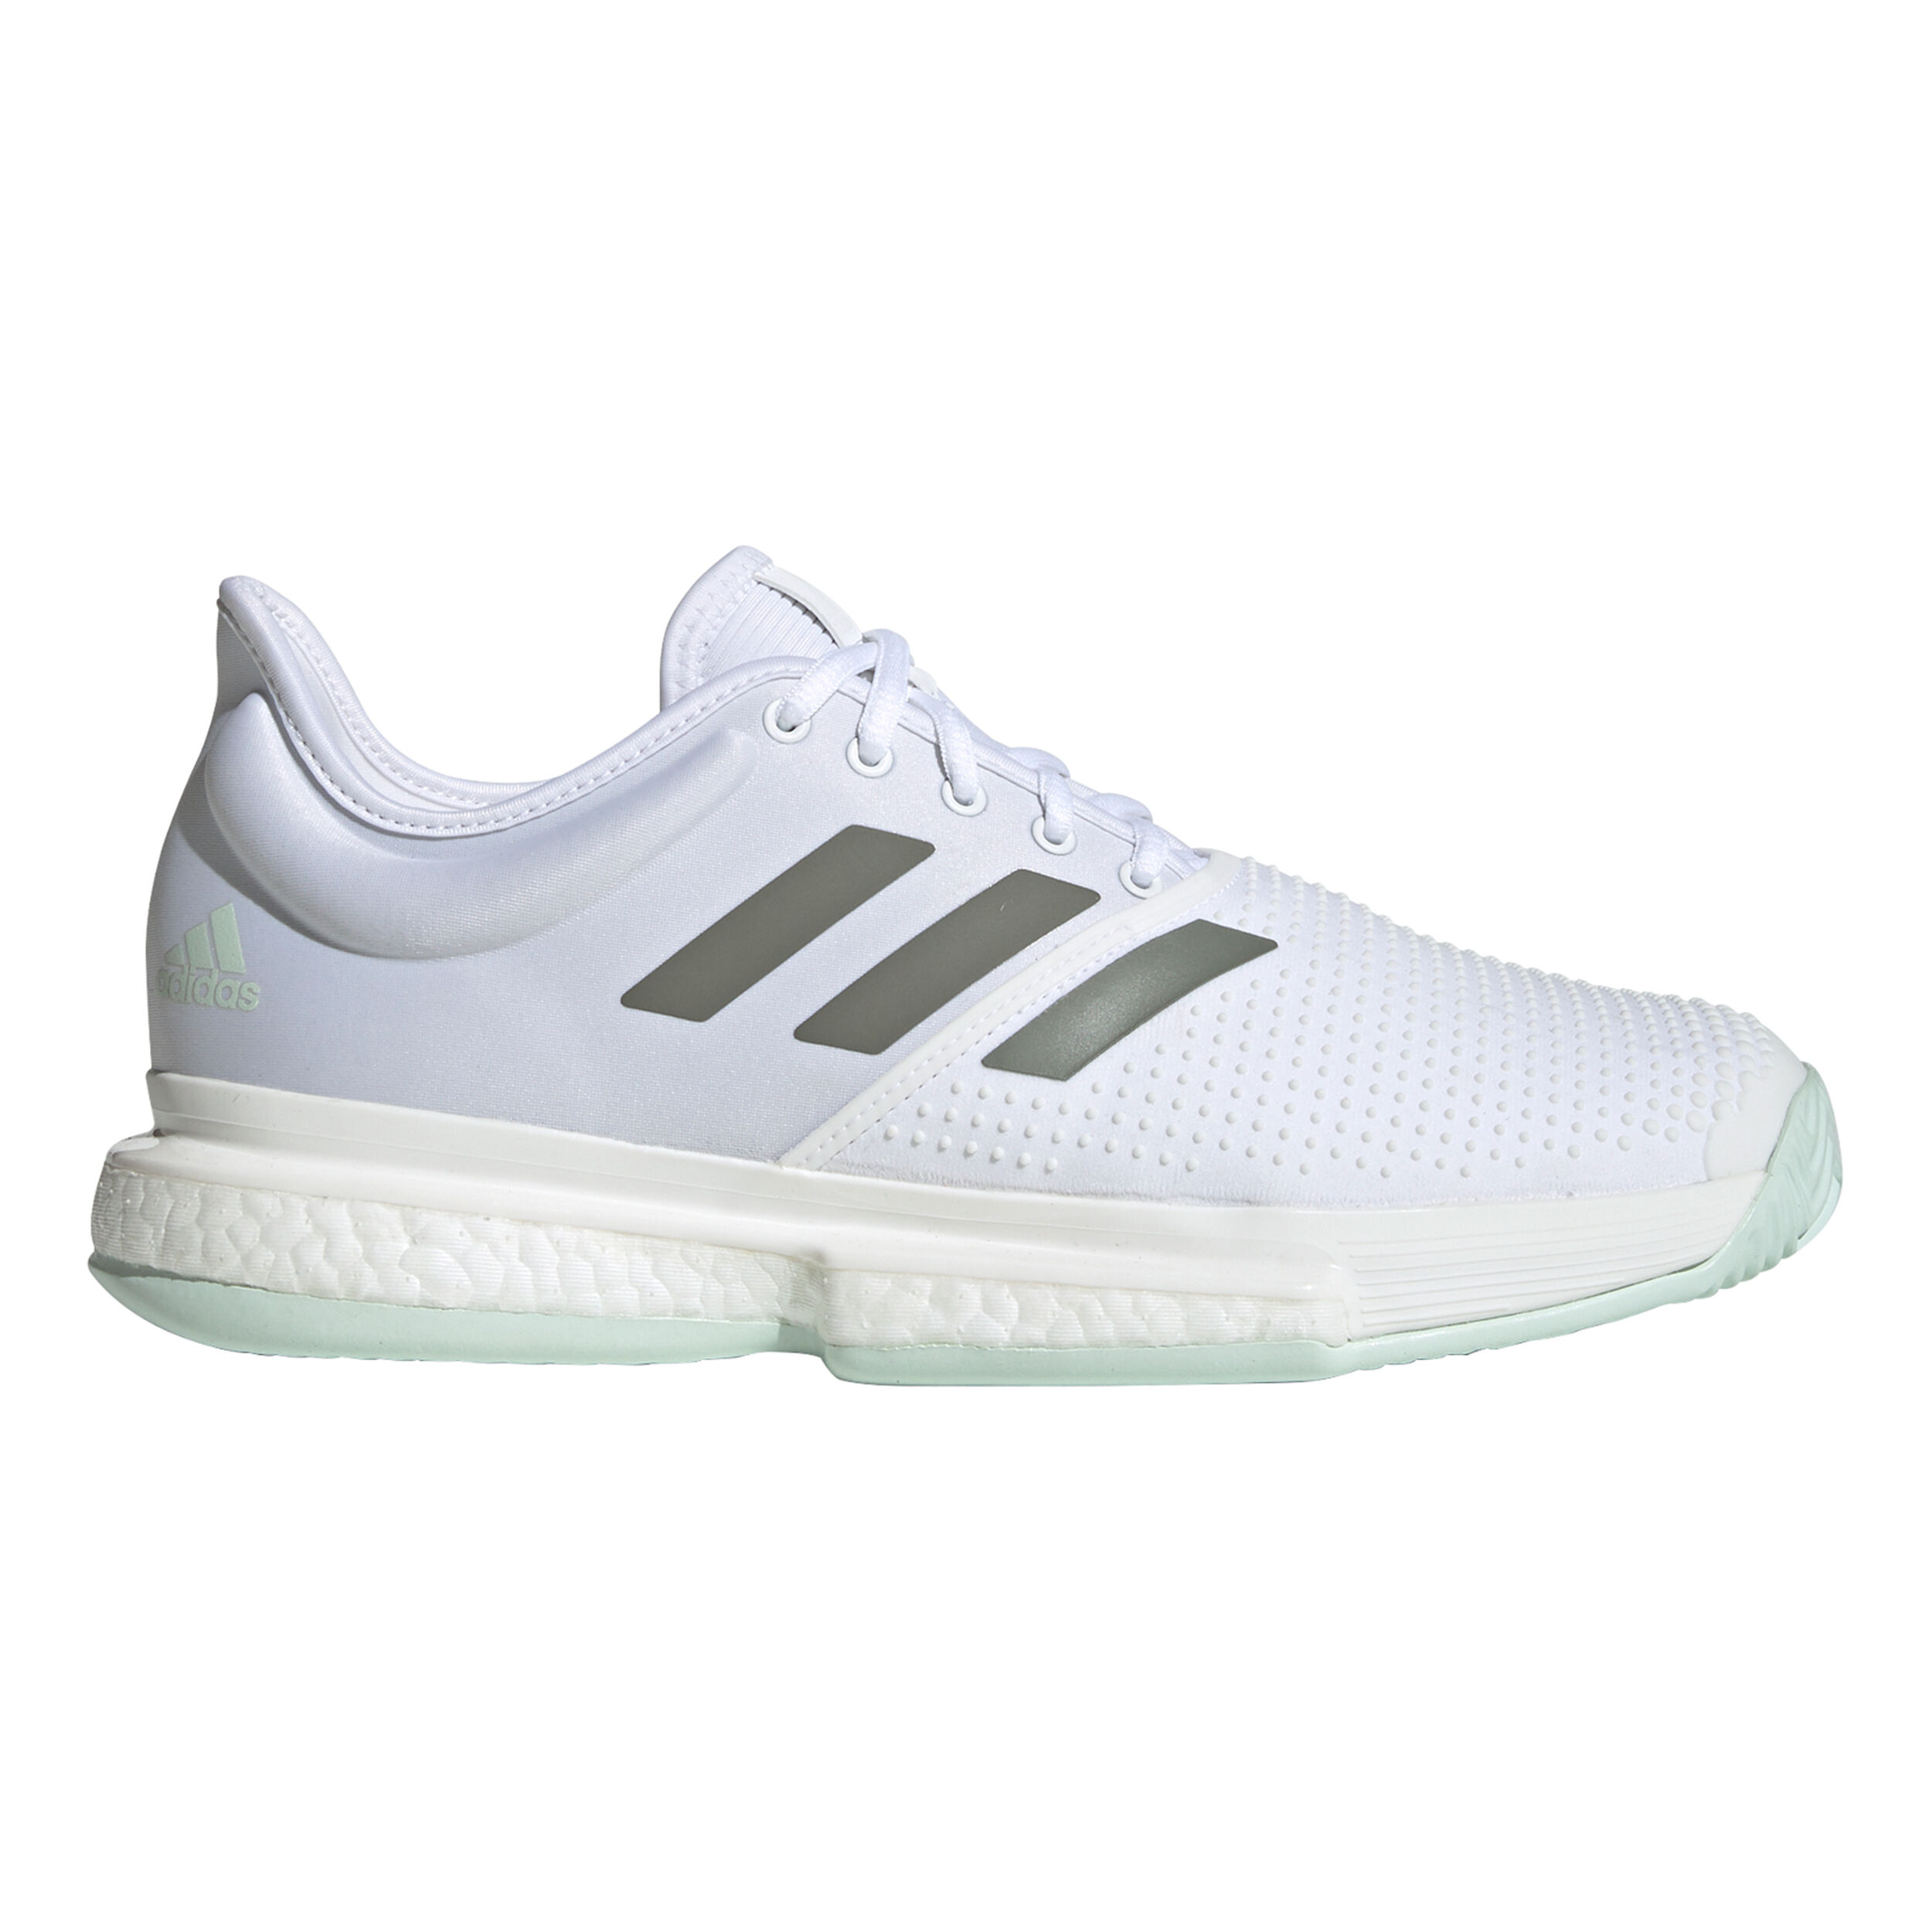 adidas Damen Tennisschuh Adizero Club skin 42 23